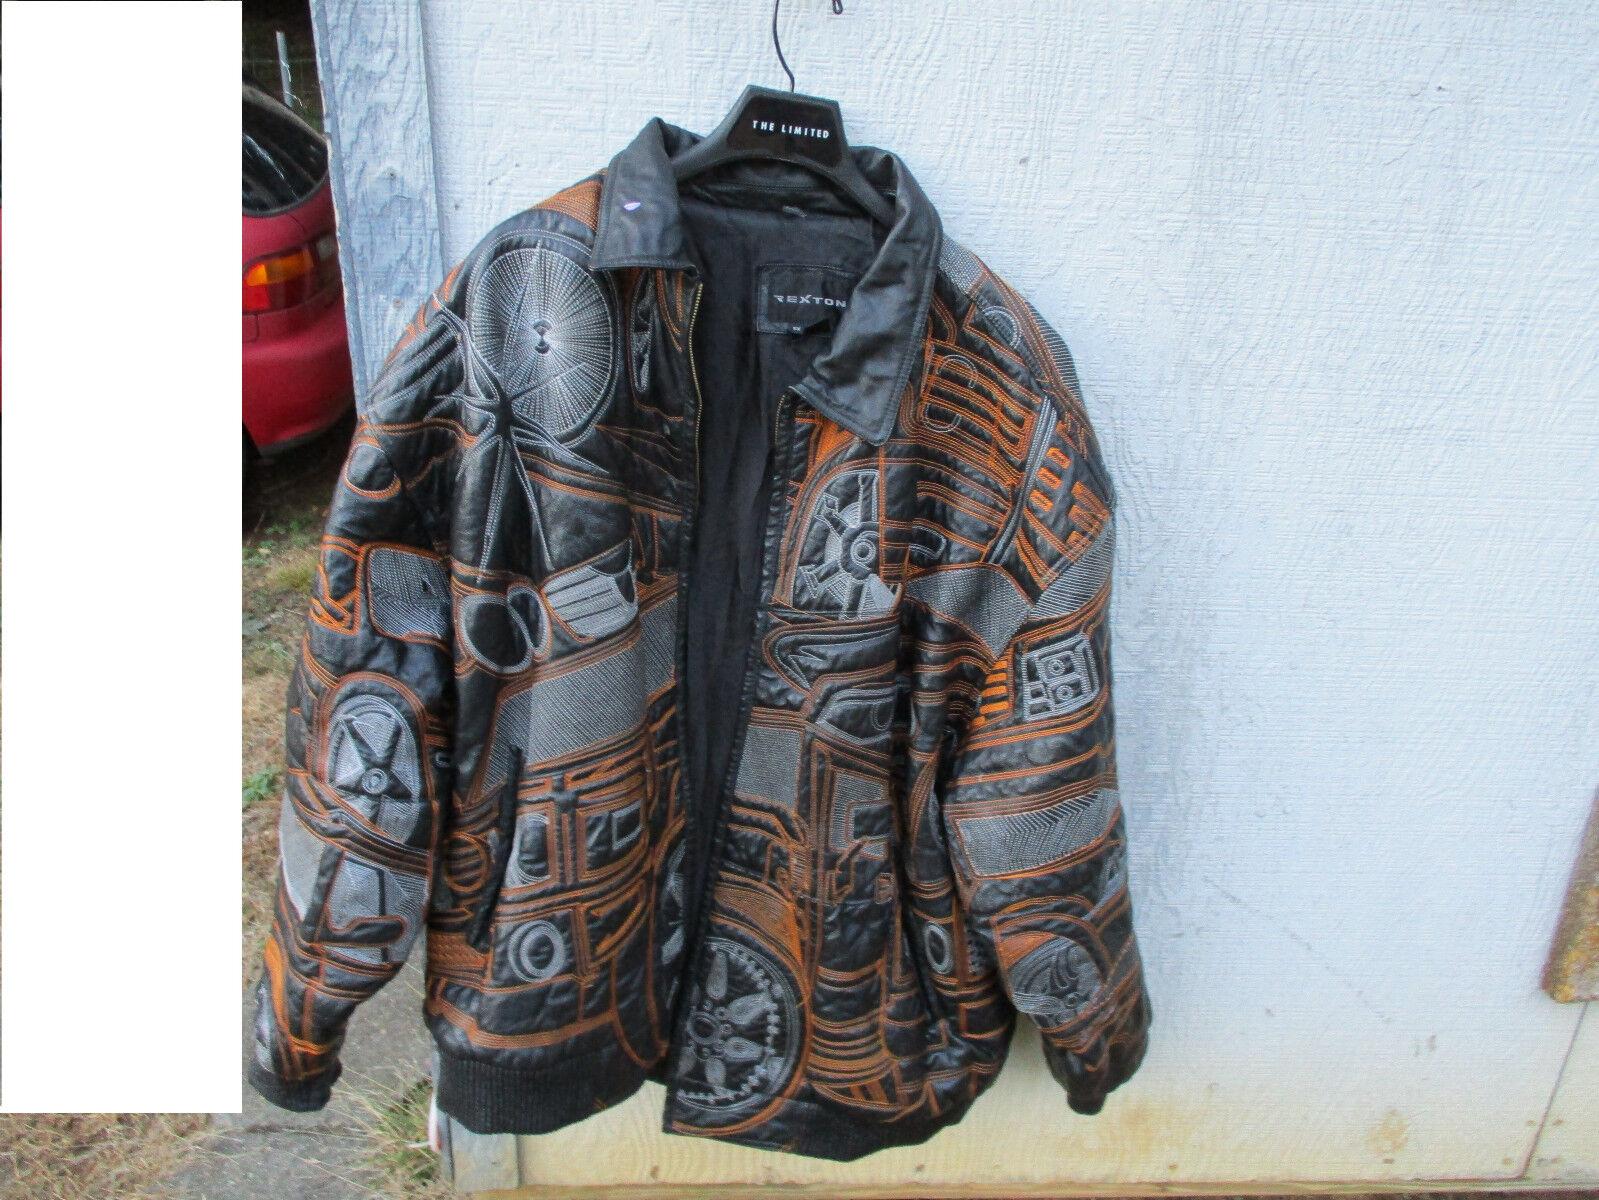 REXTON Vintage Adult Winter Leder Heavy EmbroideROT Coat - -SIZE 5XL-Rare